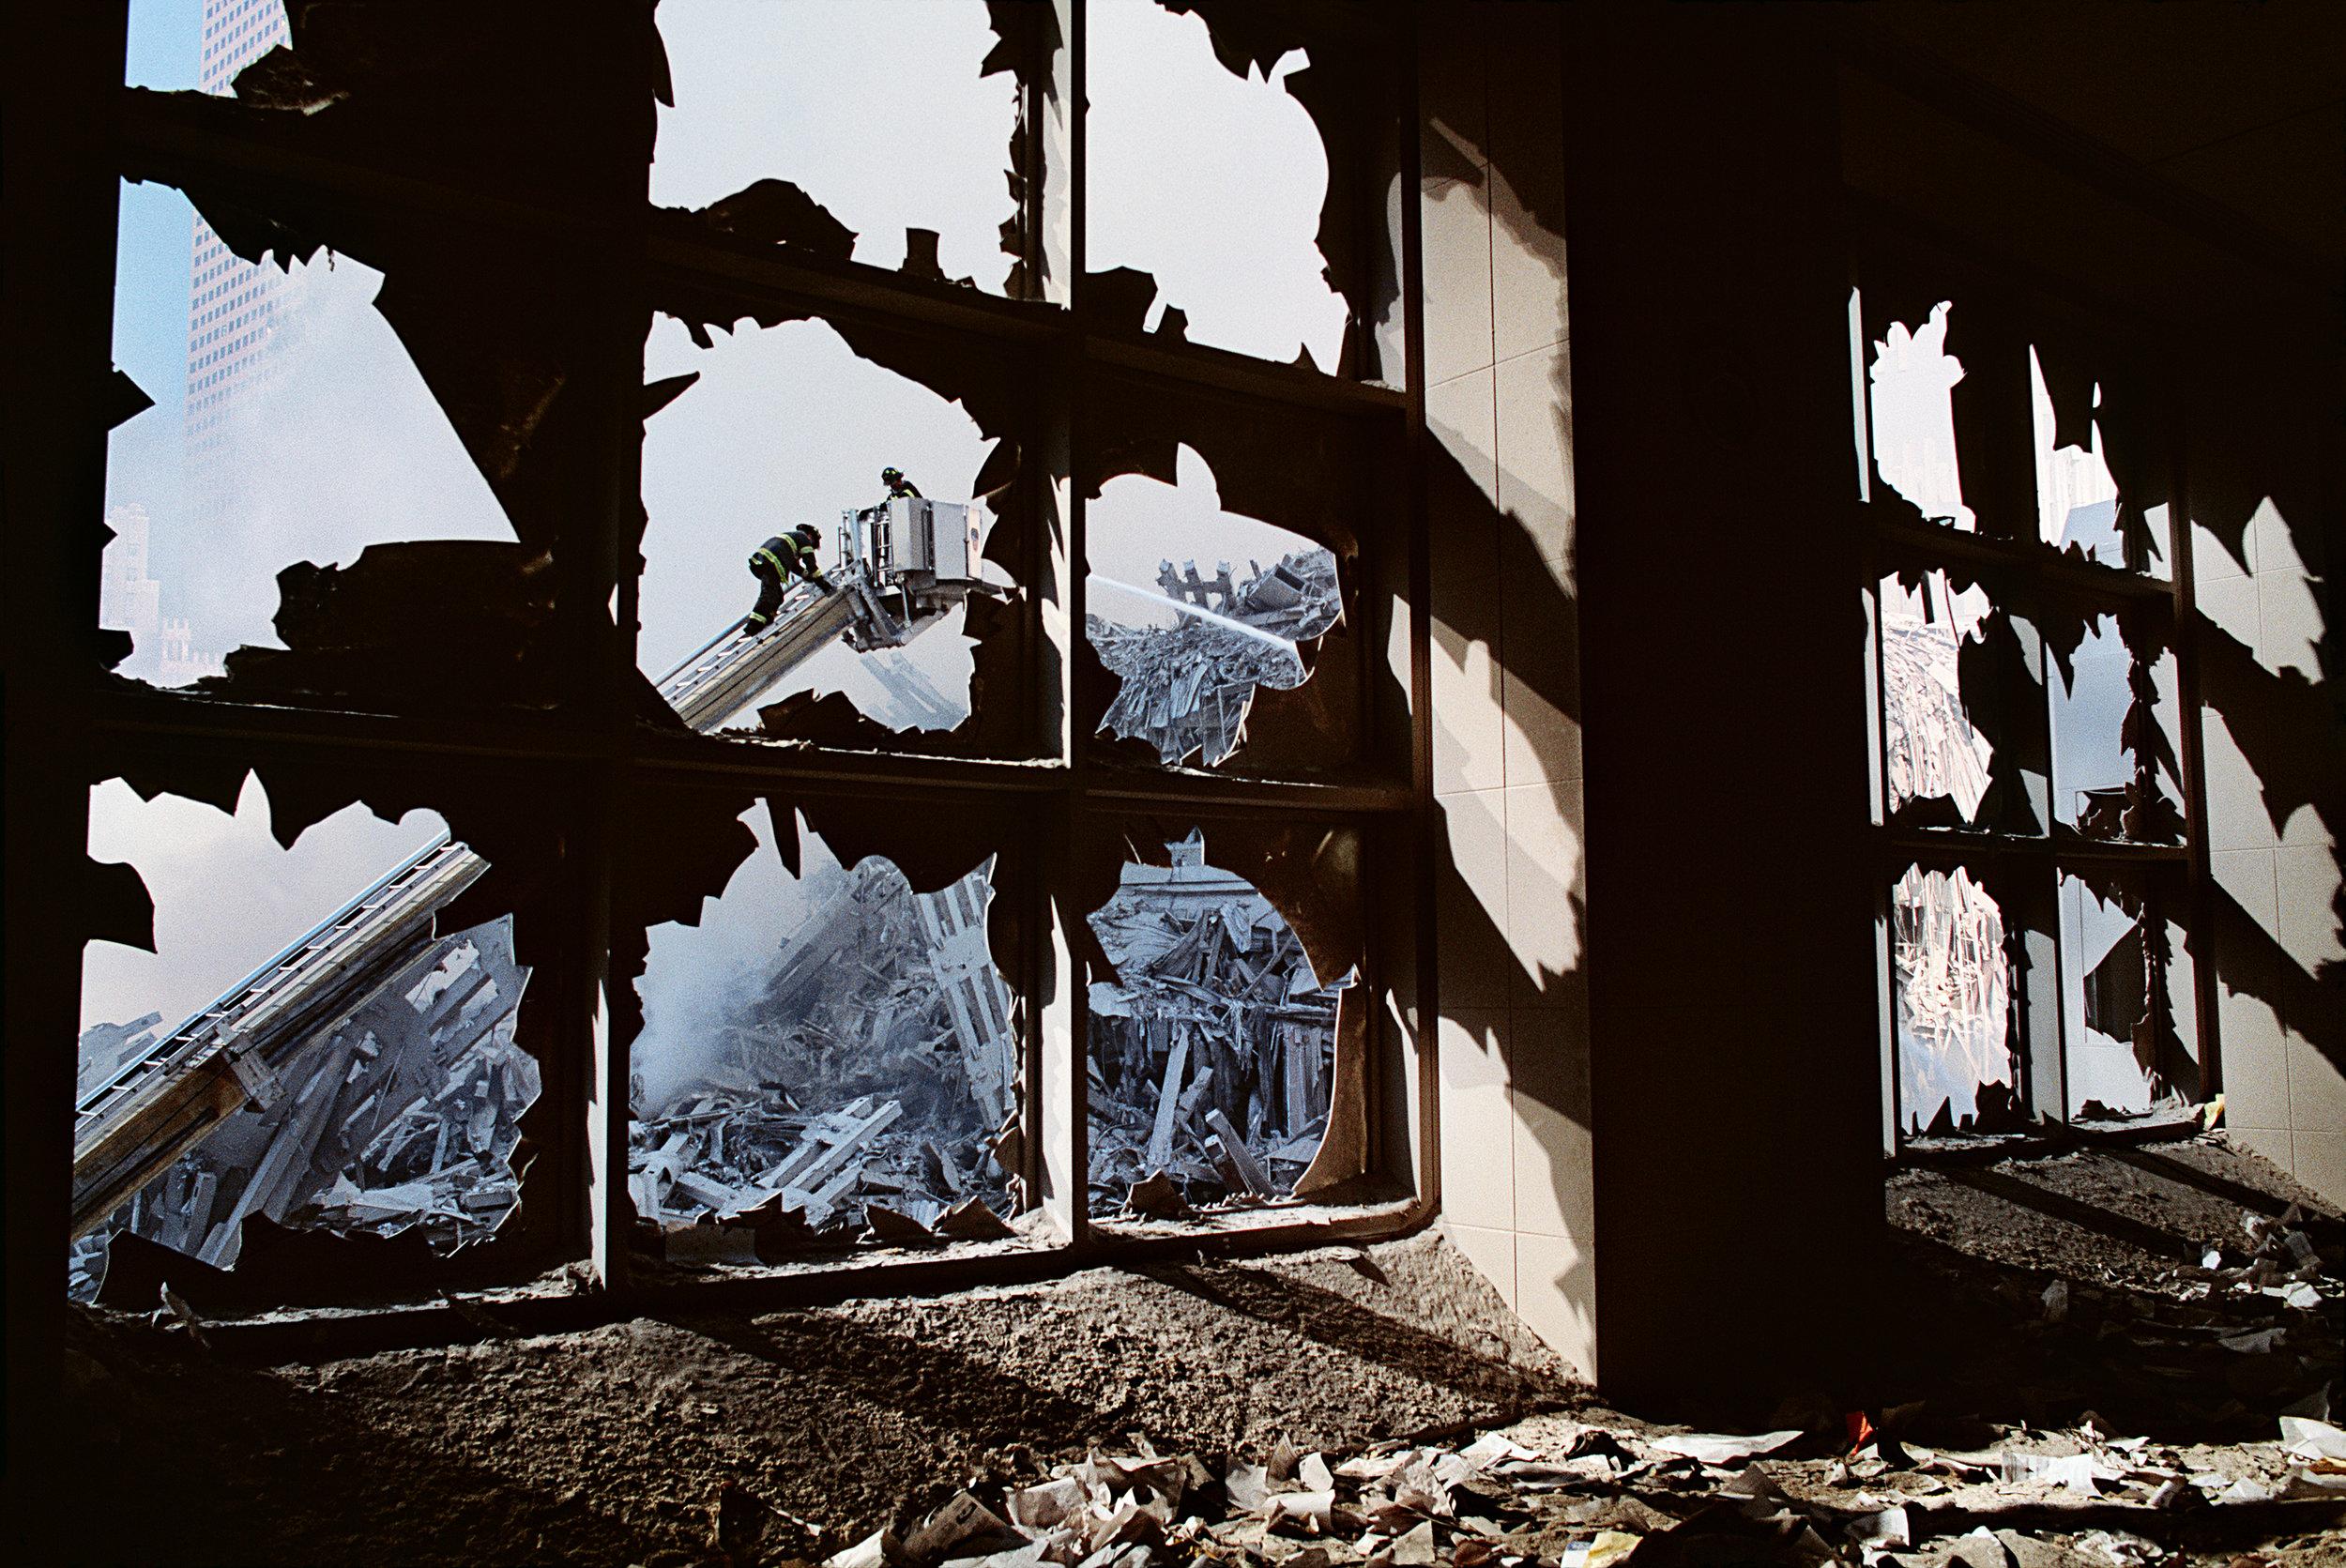 Steve McCurry, September 11, New York City, New York, 2001 - - Copyright Steve McCurry ©